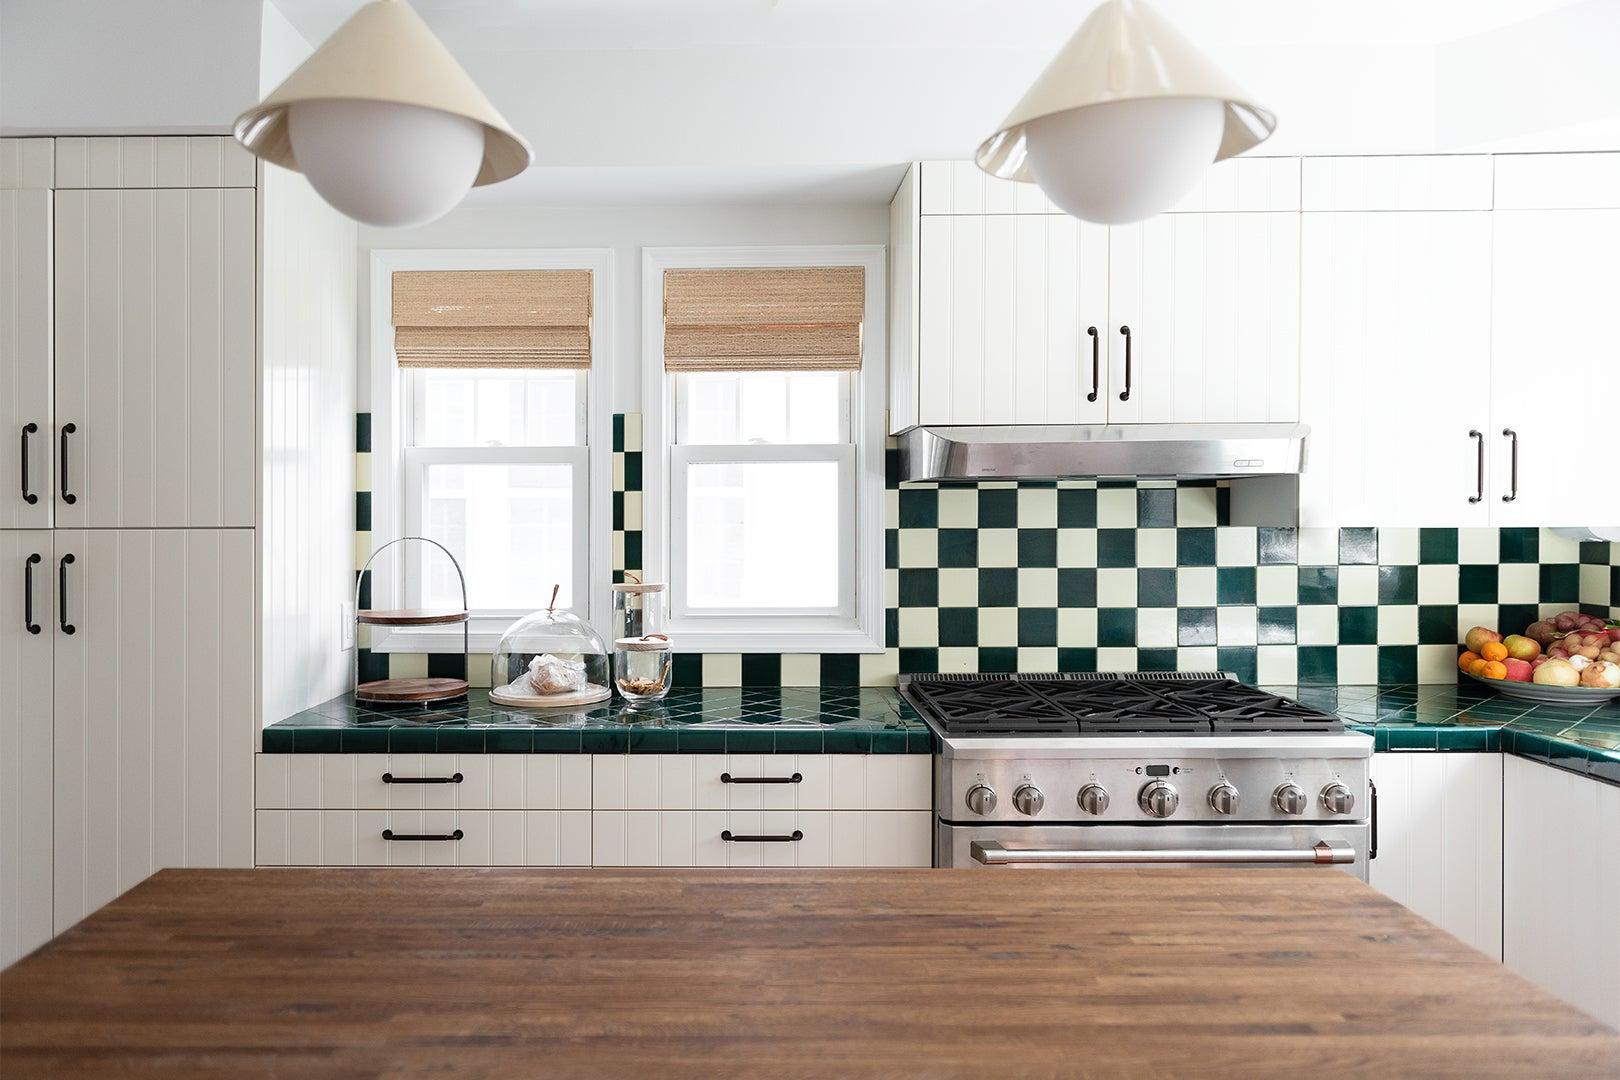 Green tiled countertops